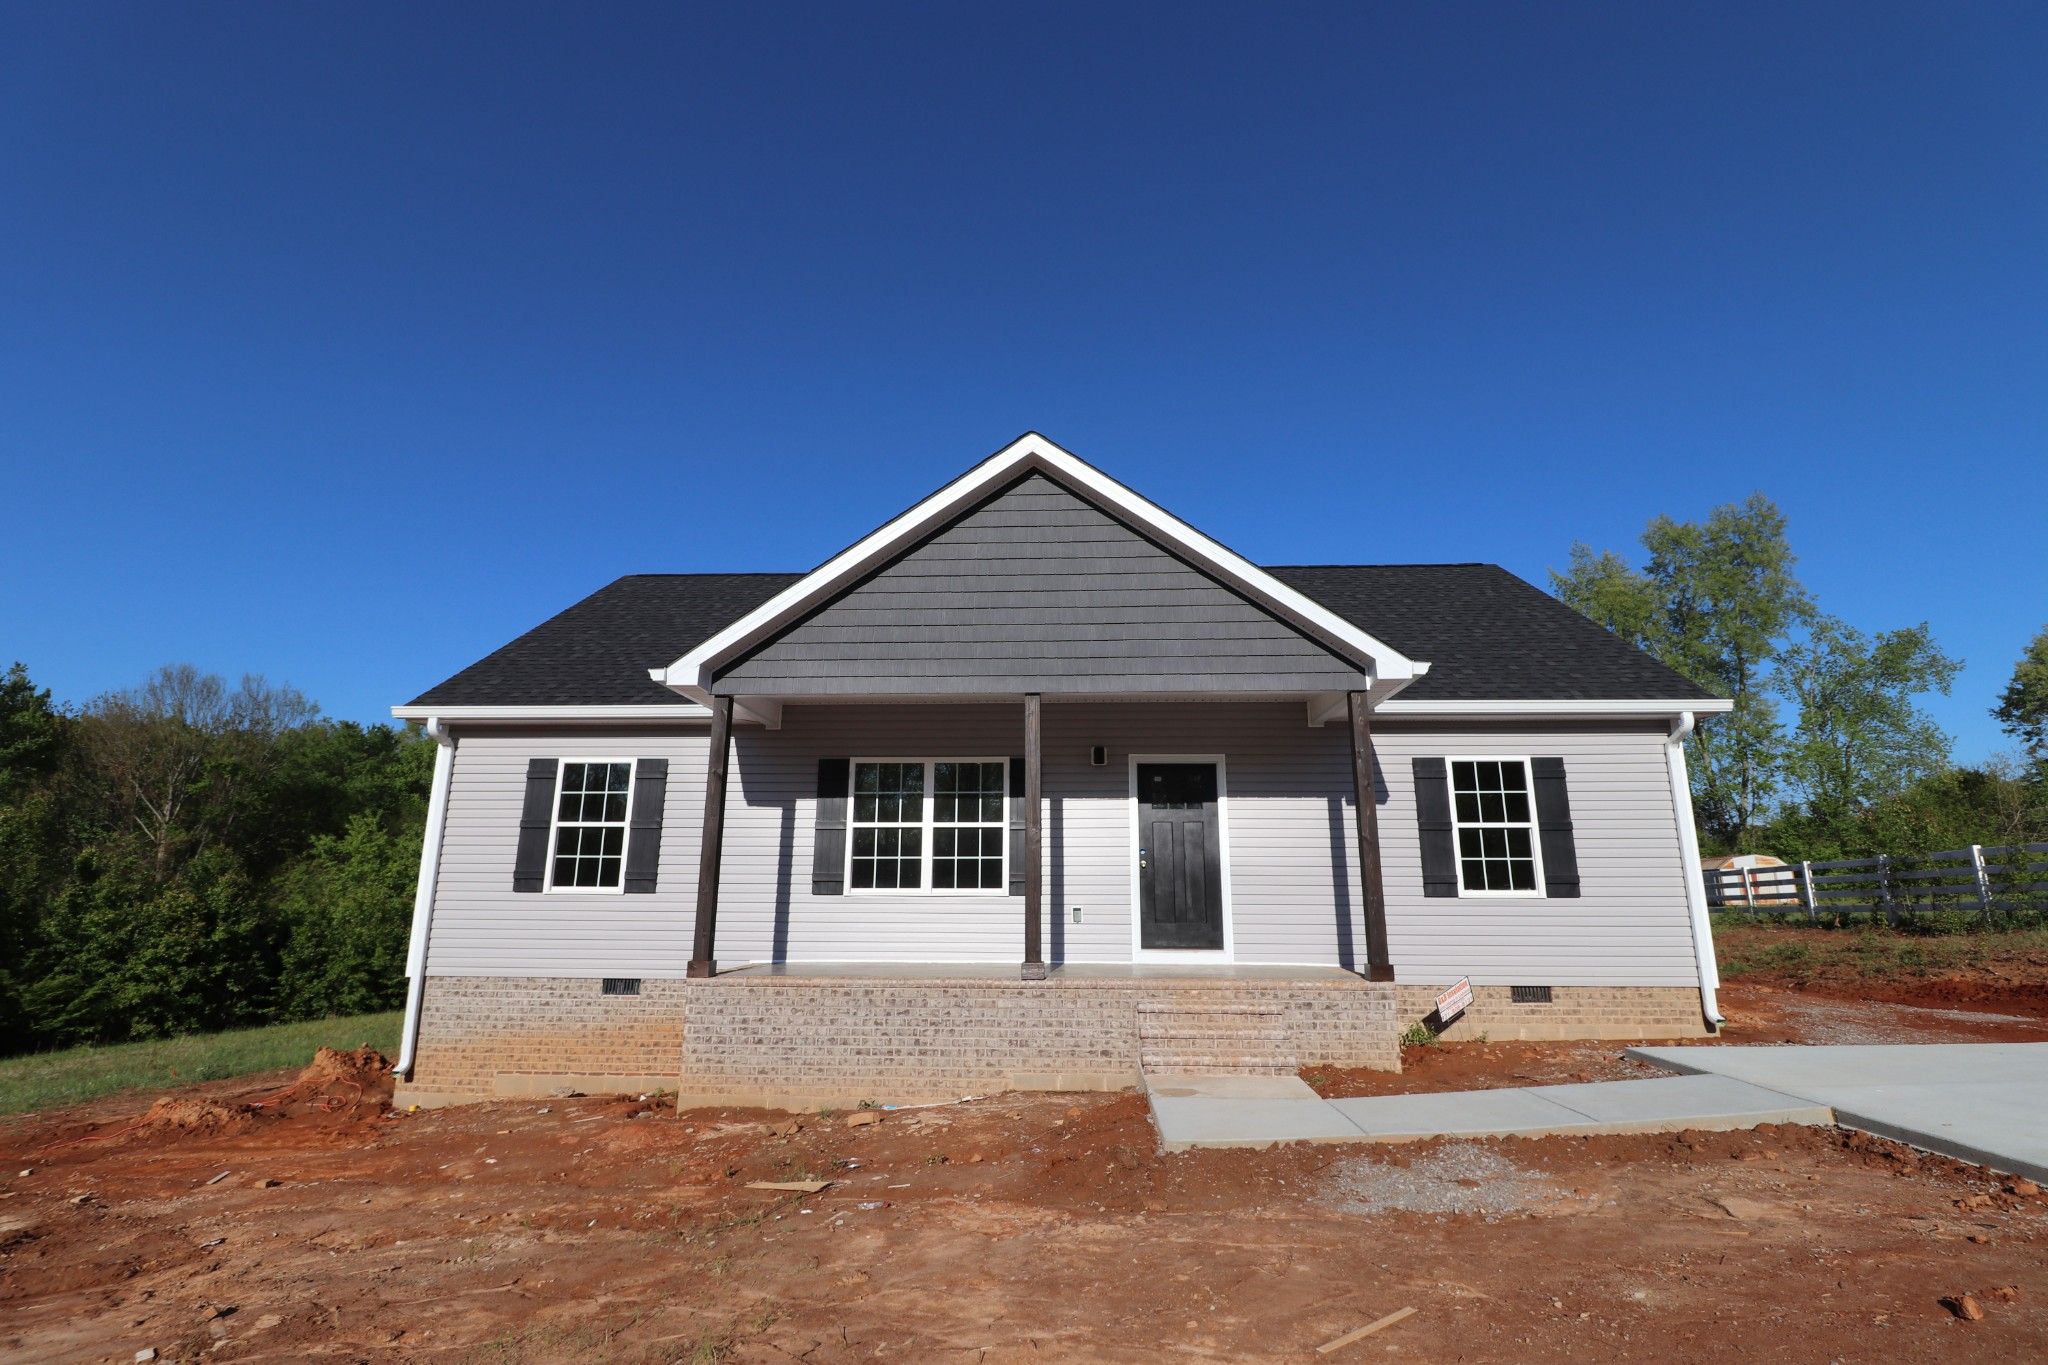 408 Willow Way, Mc Minnville, TN 37110 - Mc Minnville, TN real estate listing